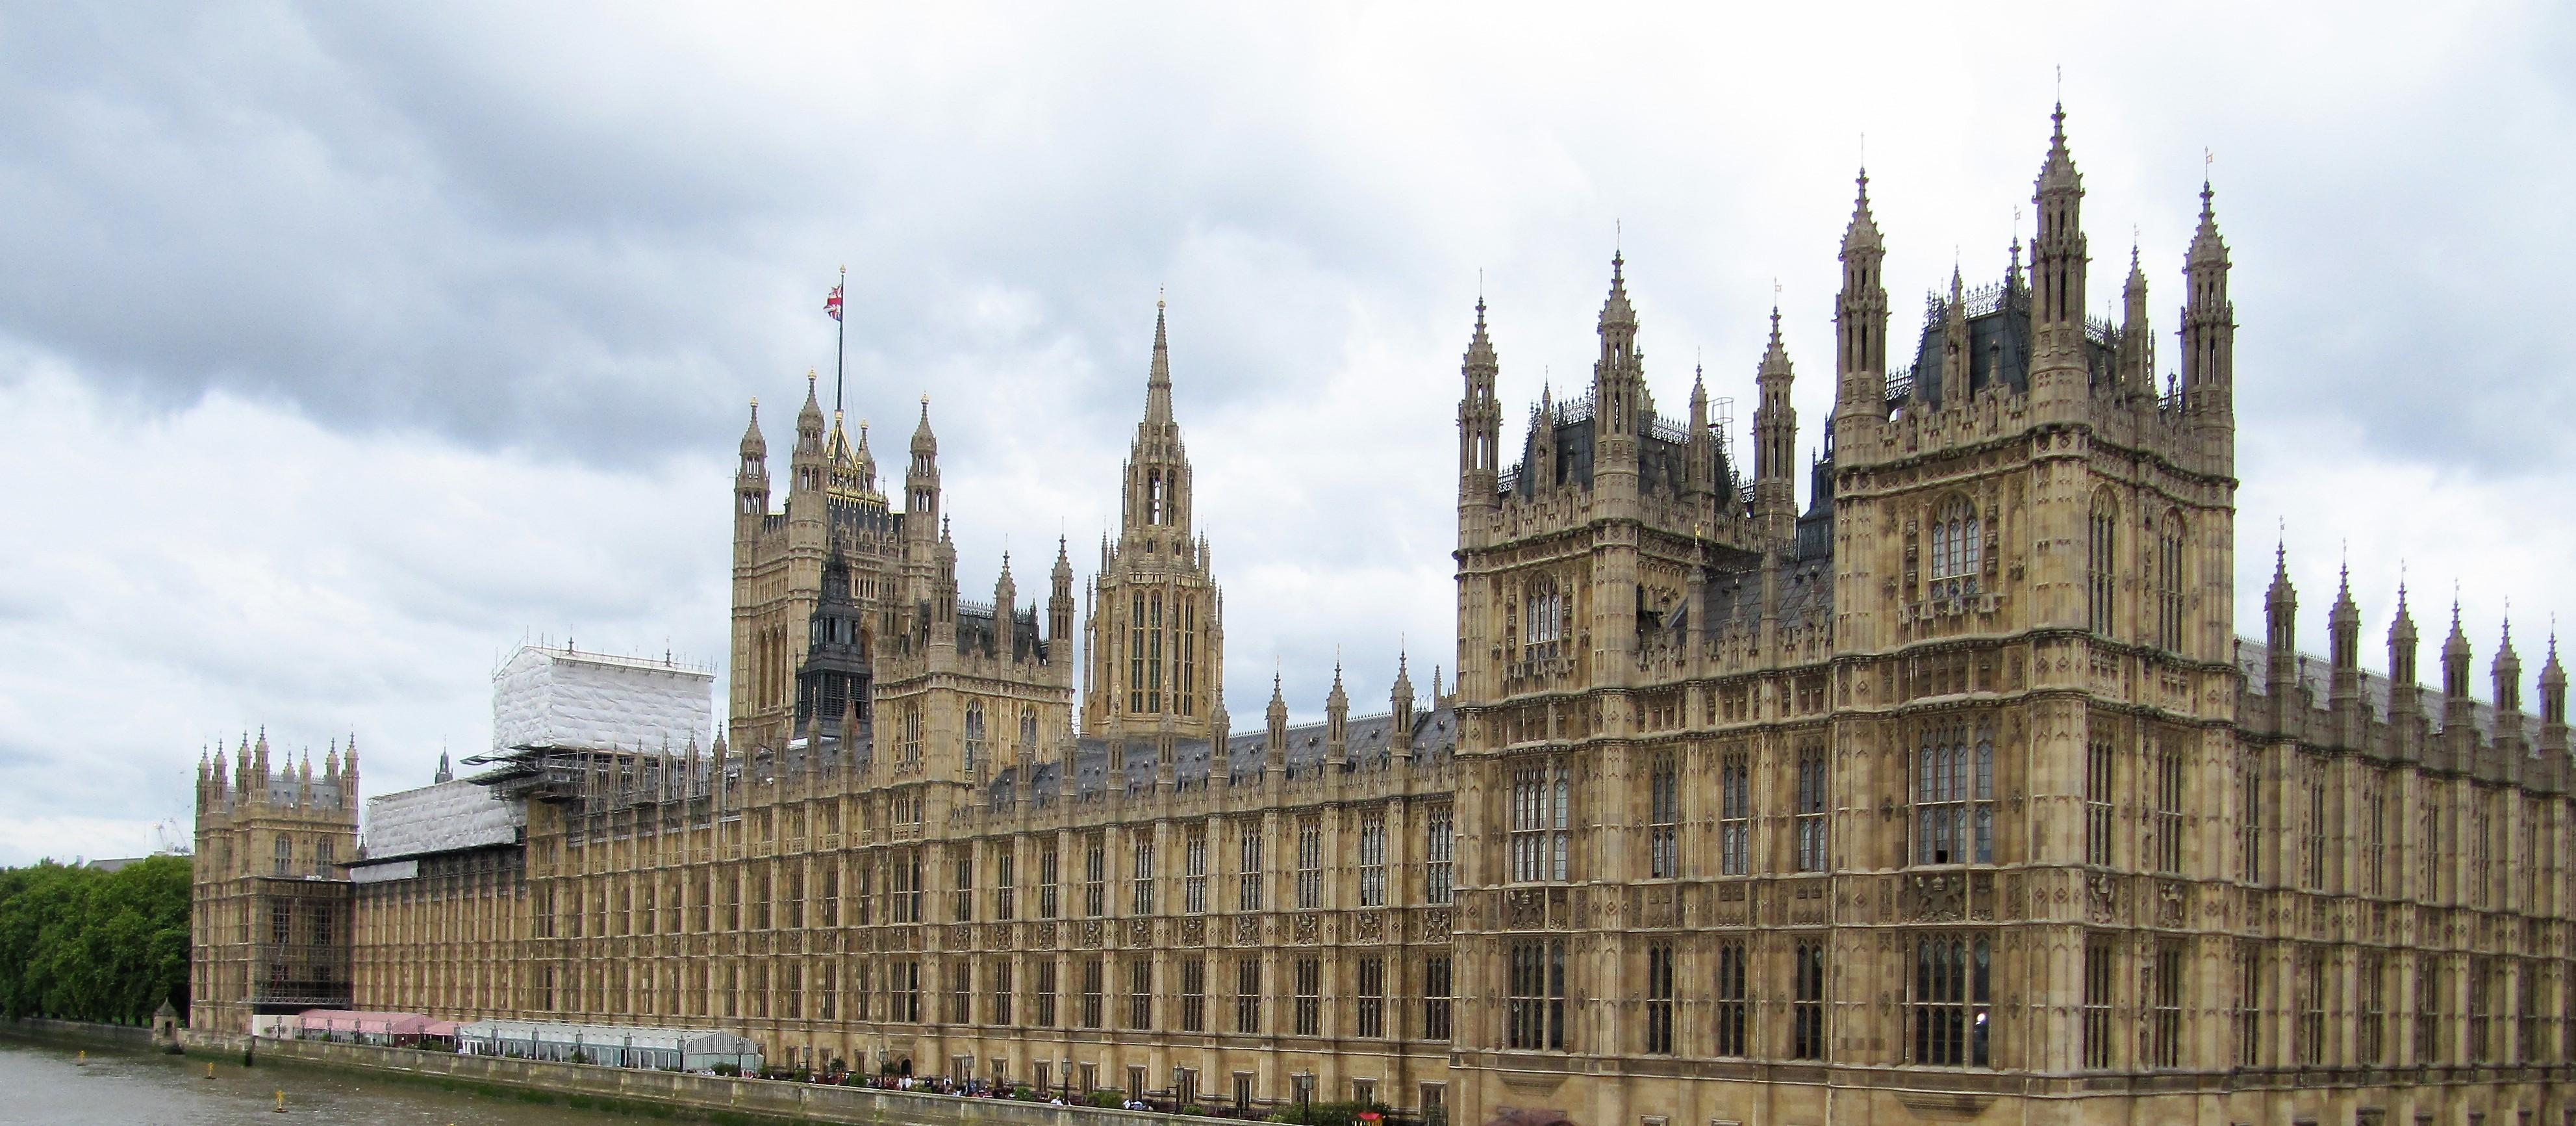 hoses of parlament